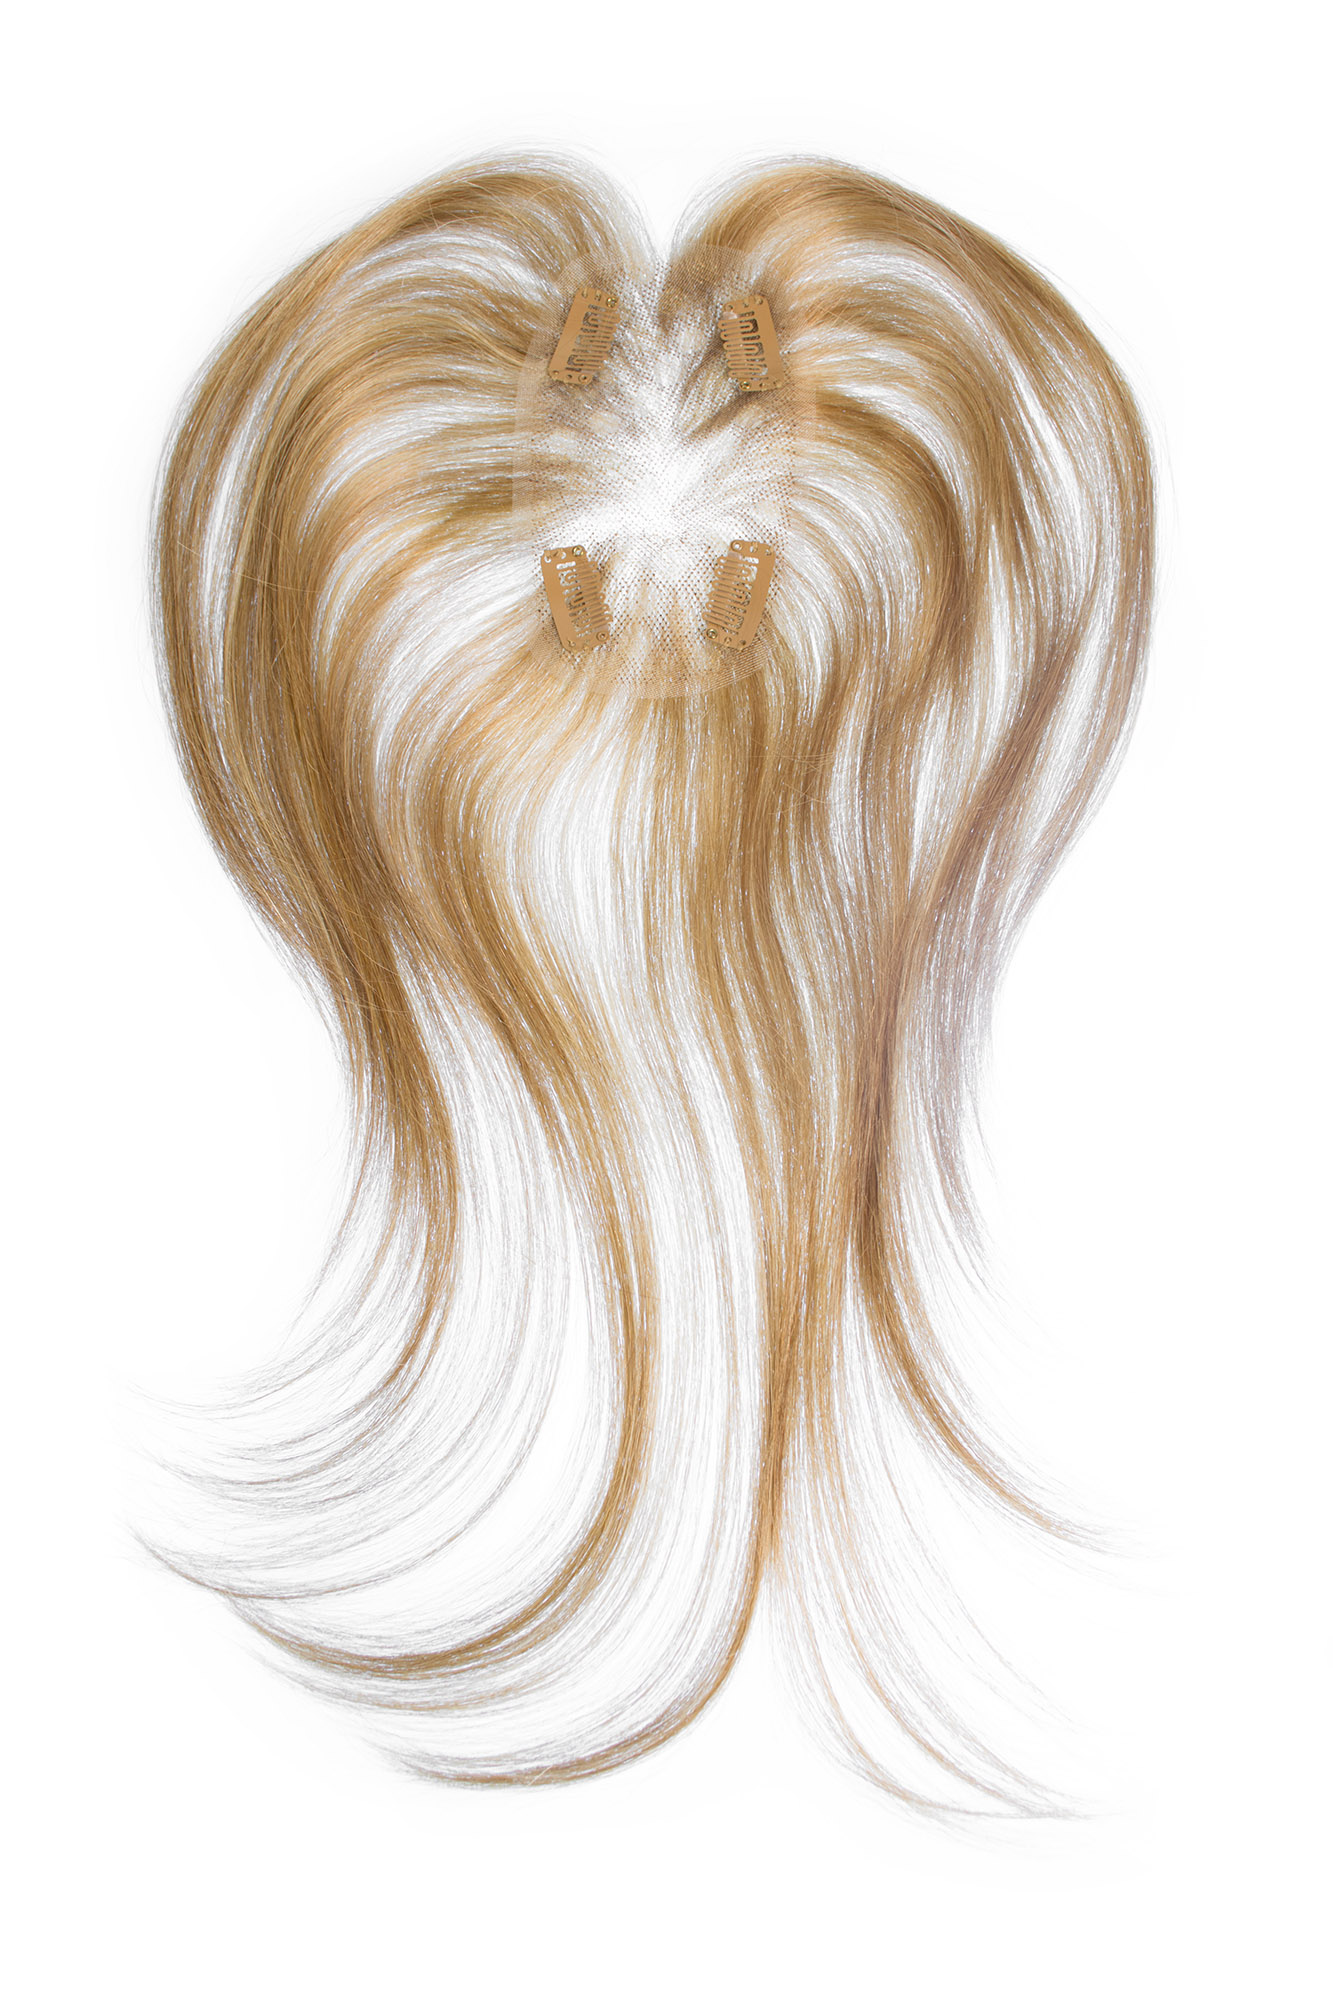 Echthaar Haarteile Echthaar Haarteile Haarteile